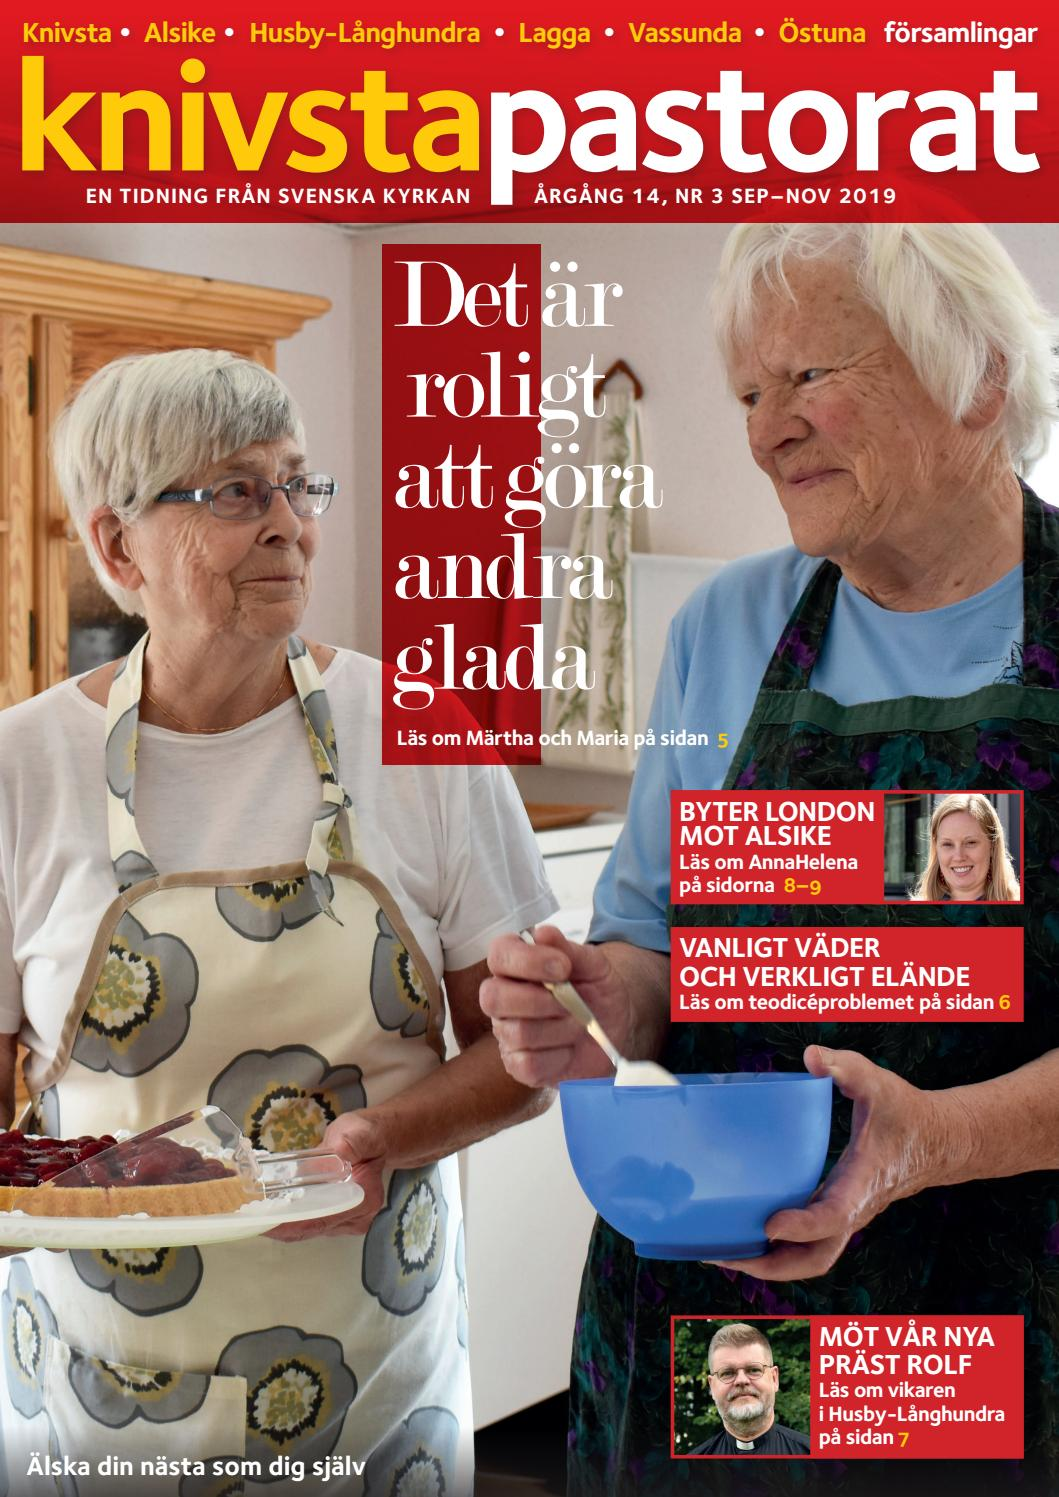 Camilla Croon, 47 r i Knivsta p Alsike-rby 203 - telefon